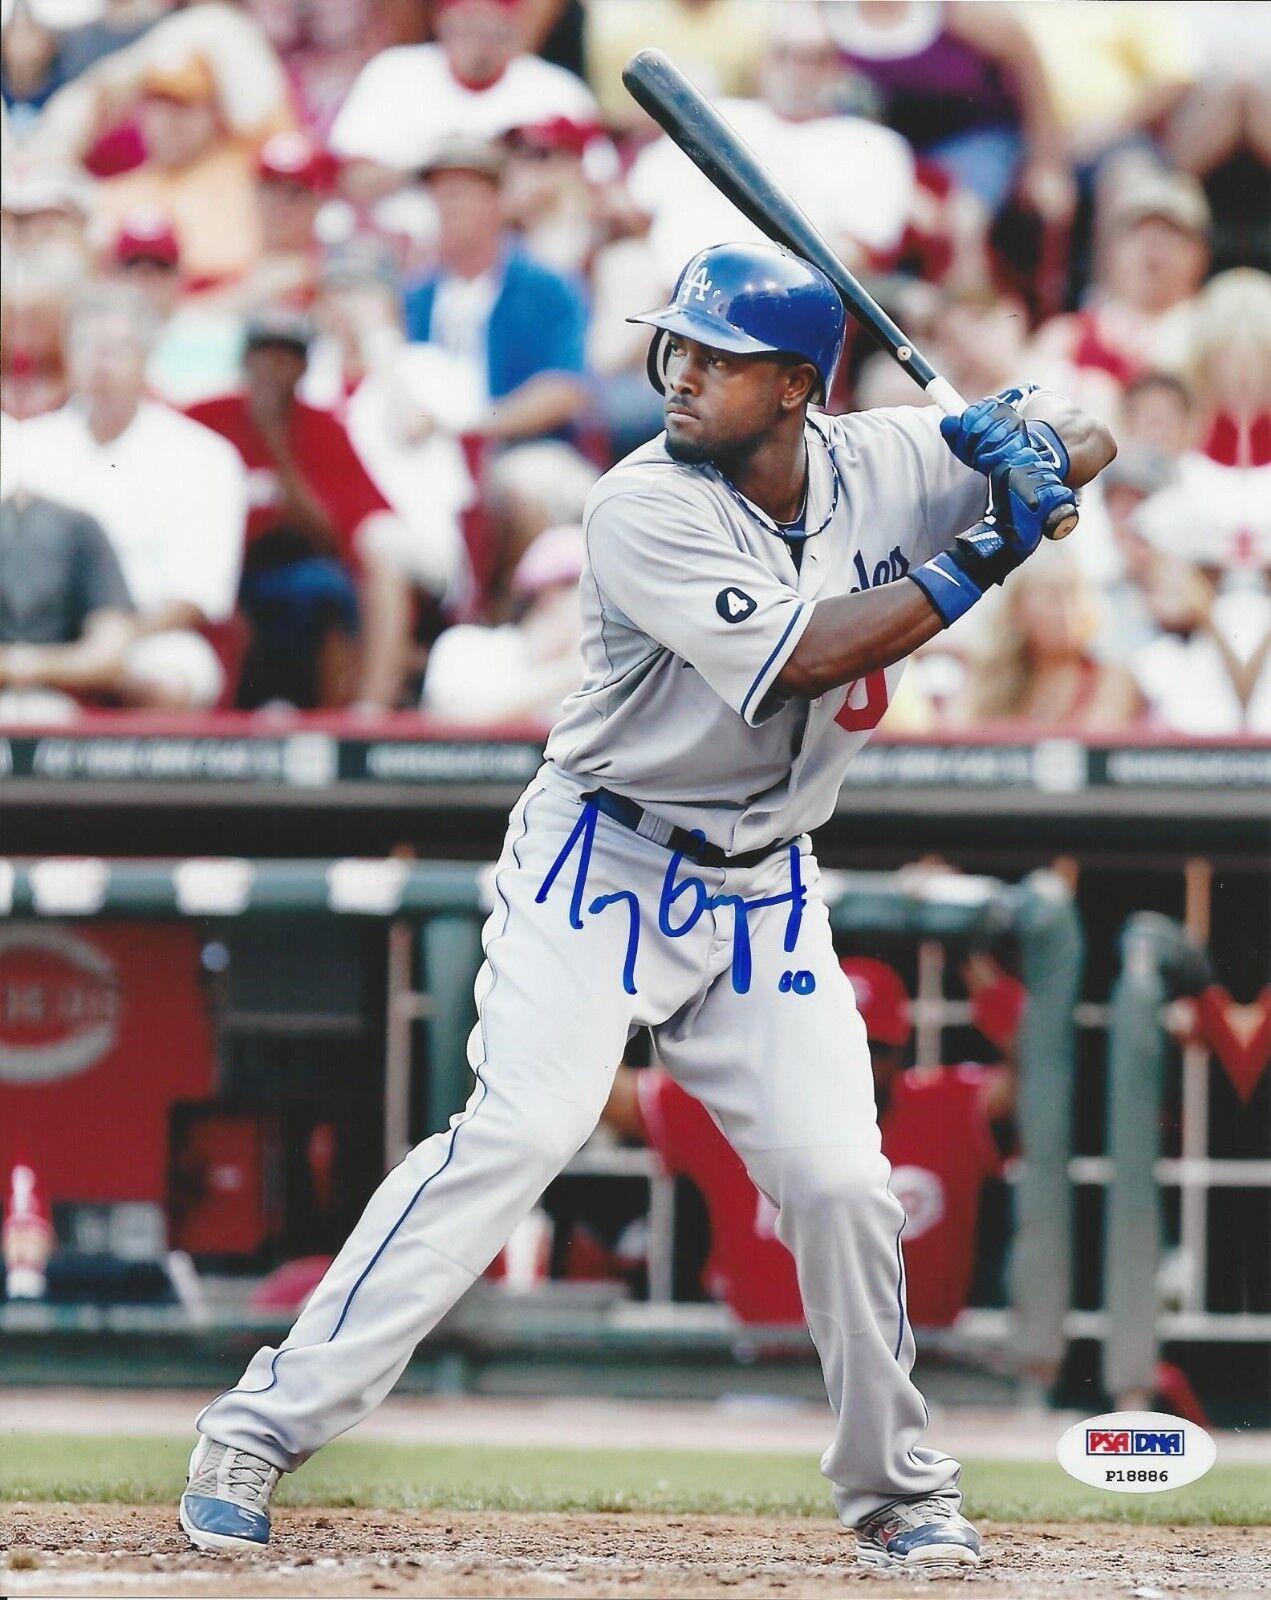 Tony Gwynn Jr. Los Angeles Dodgers Signed 8x10 Photo - PSA/DNA # P18886